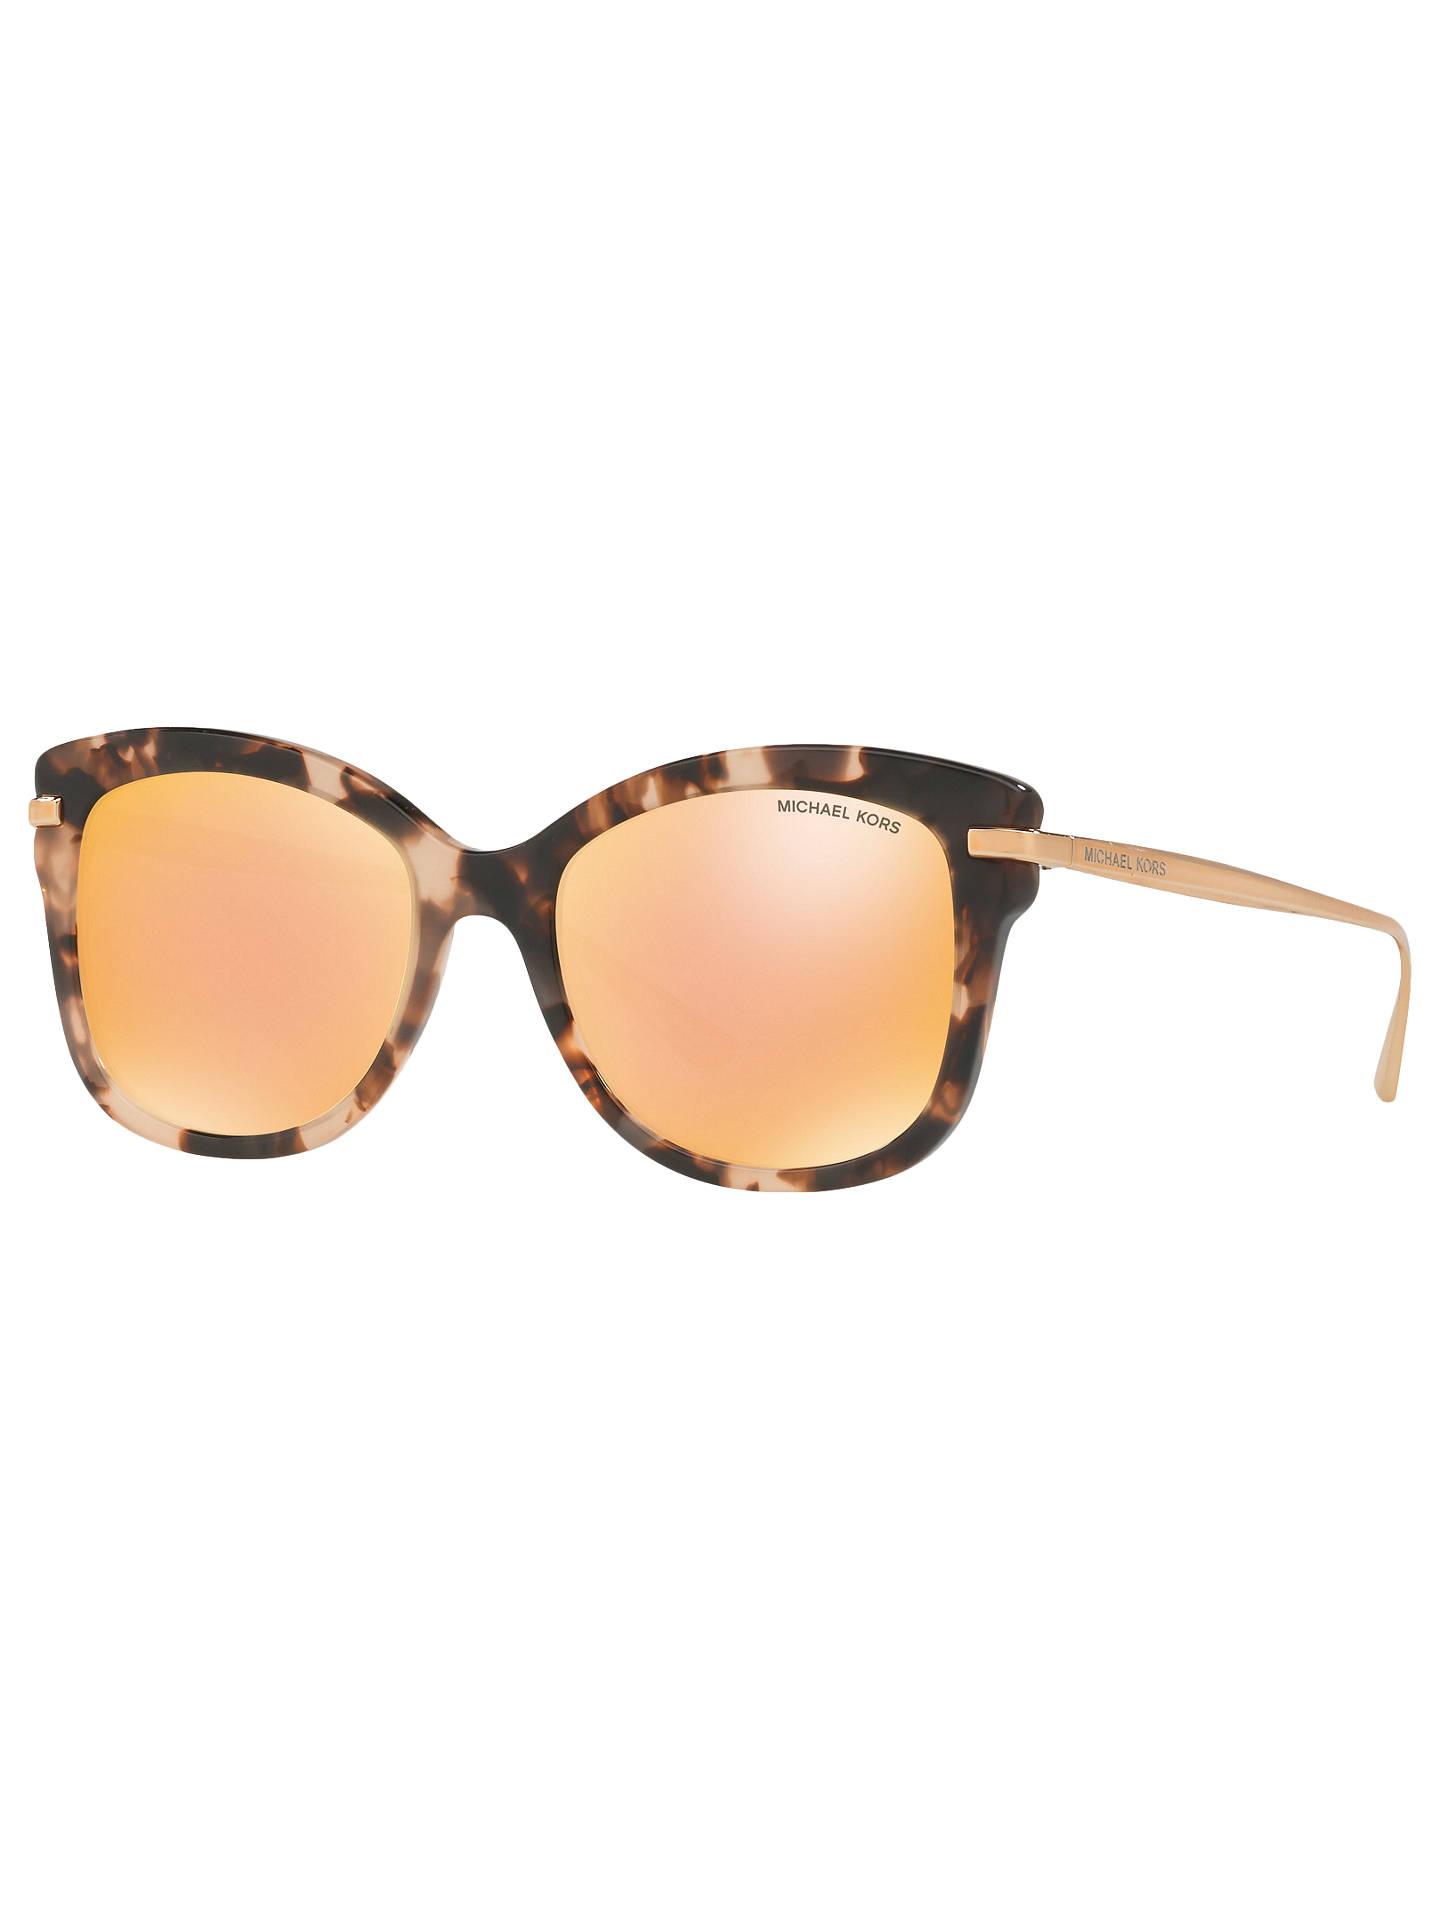 d98bf3e0f0 BuyMichael Kors MK2047 Lia Square Sunglasses